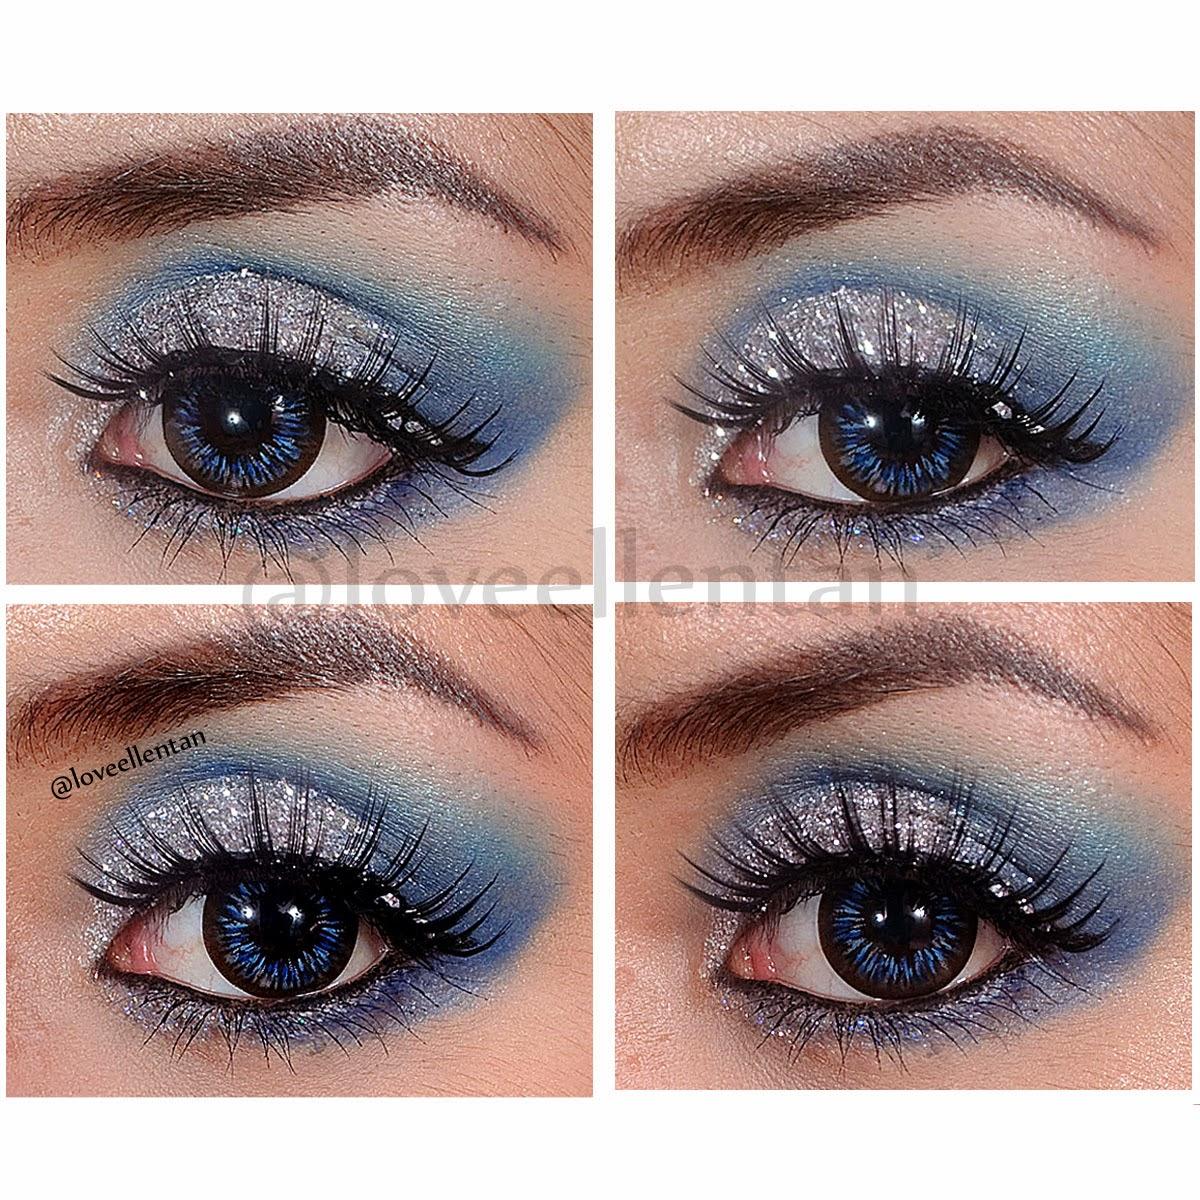 Sparkling Glitter Party Makeup Tutorial | ....u2665 Loveellentan